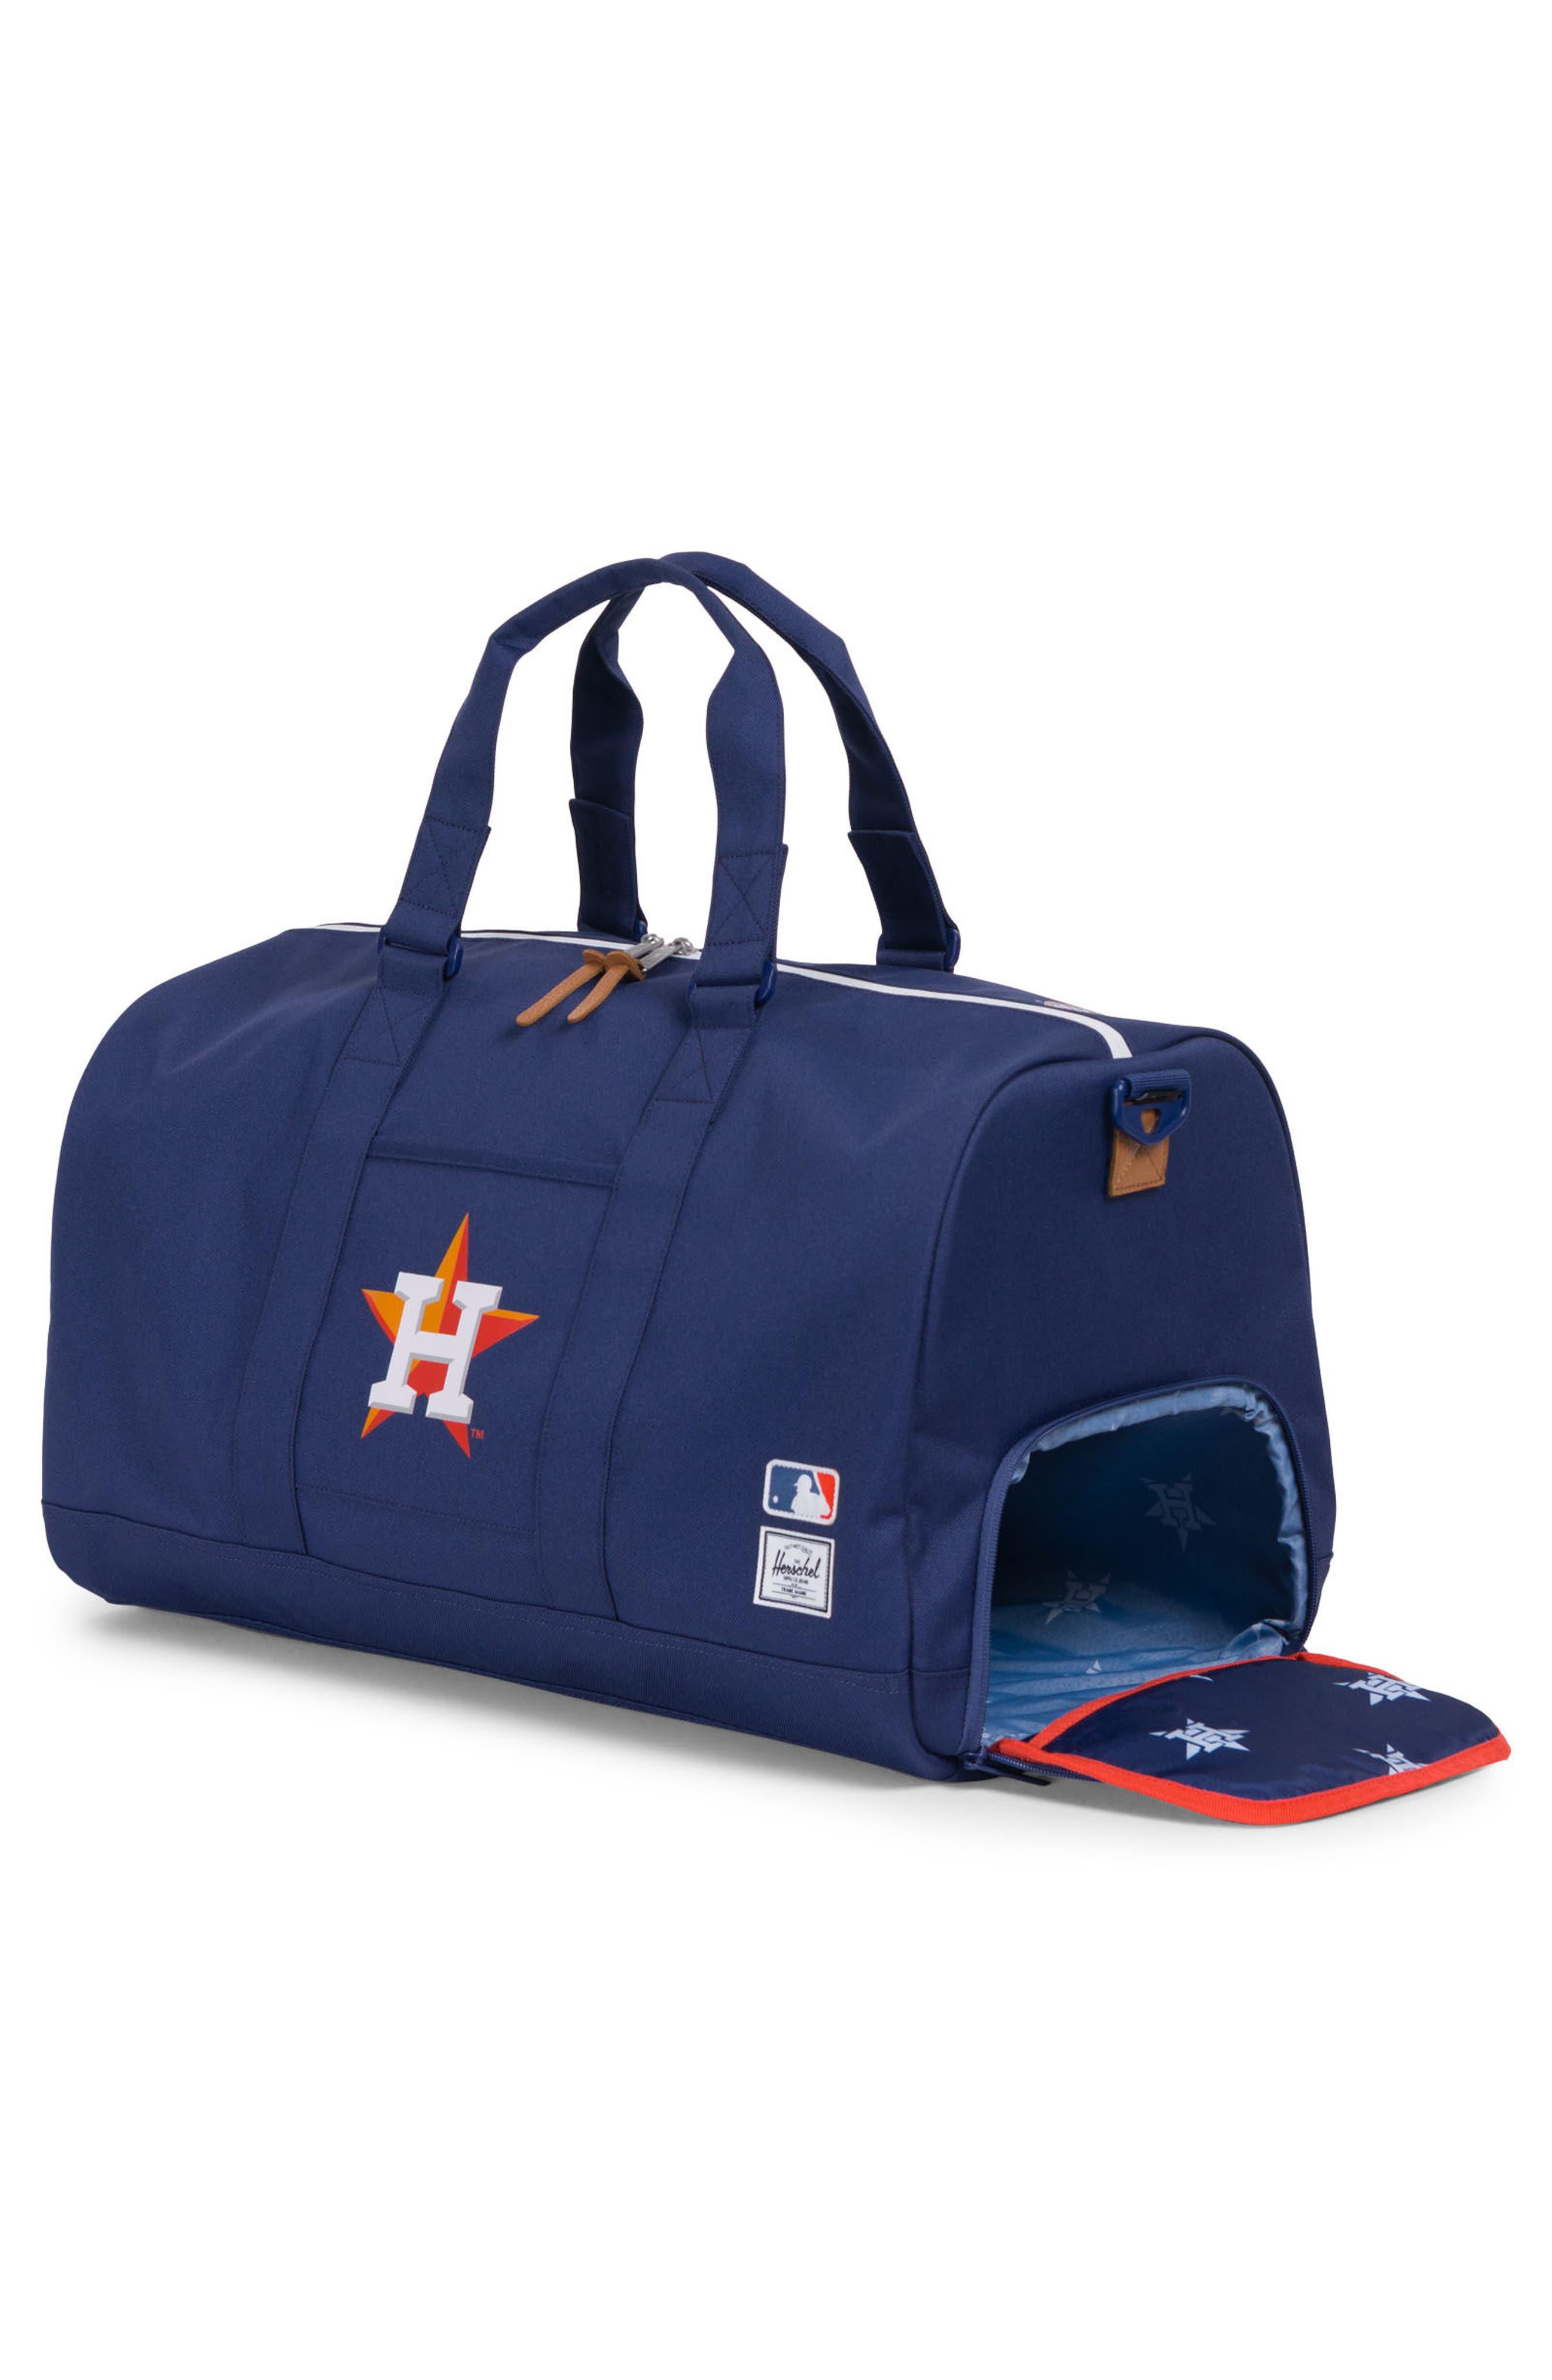 Alternate Image 3  - Herschel Supply Co. Novel - MLB American League Duffel Bag